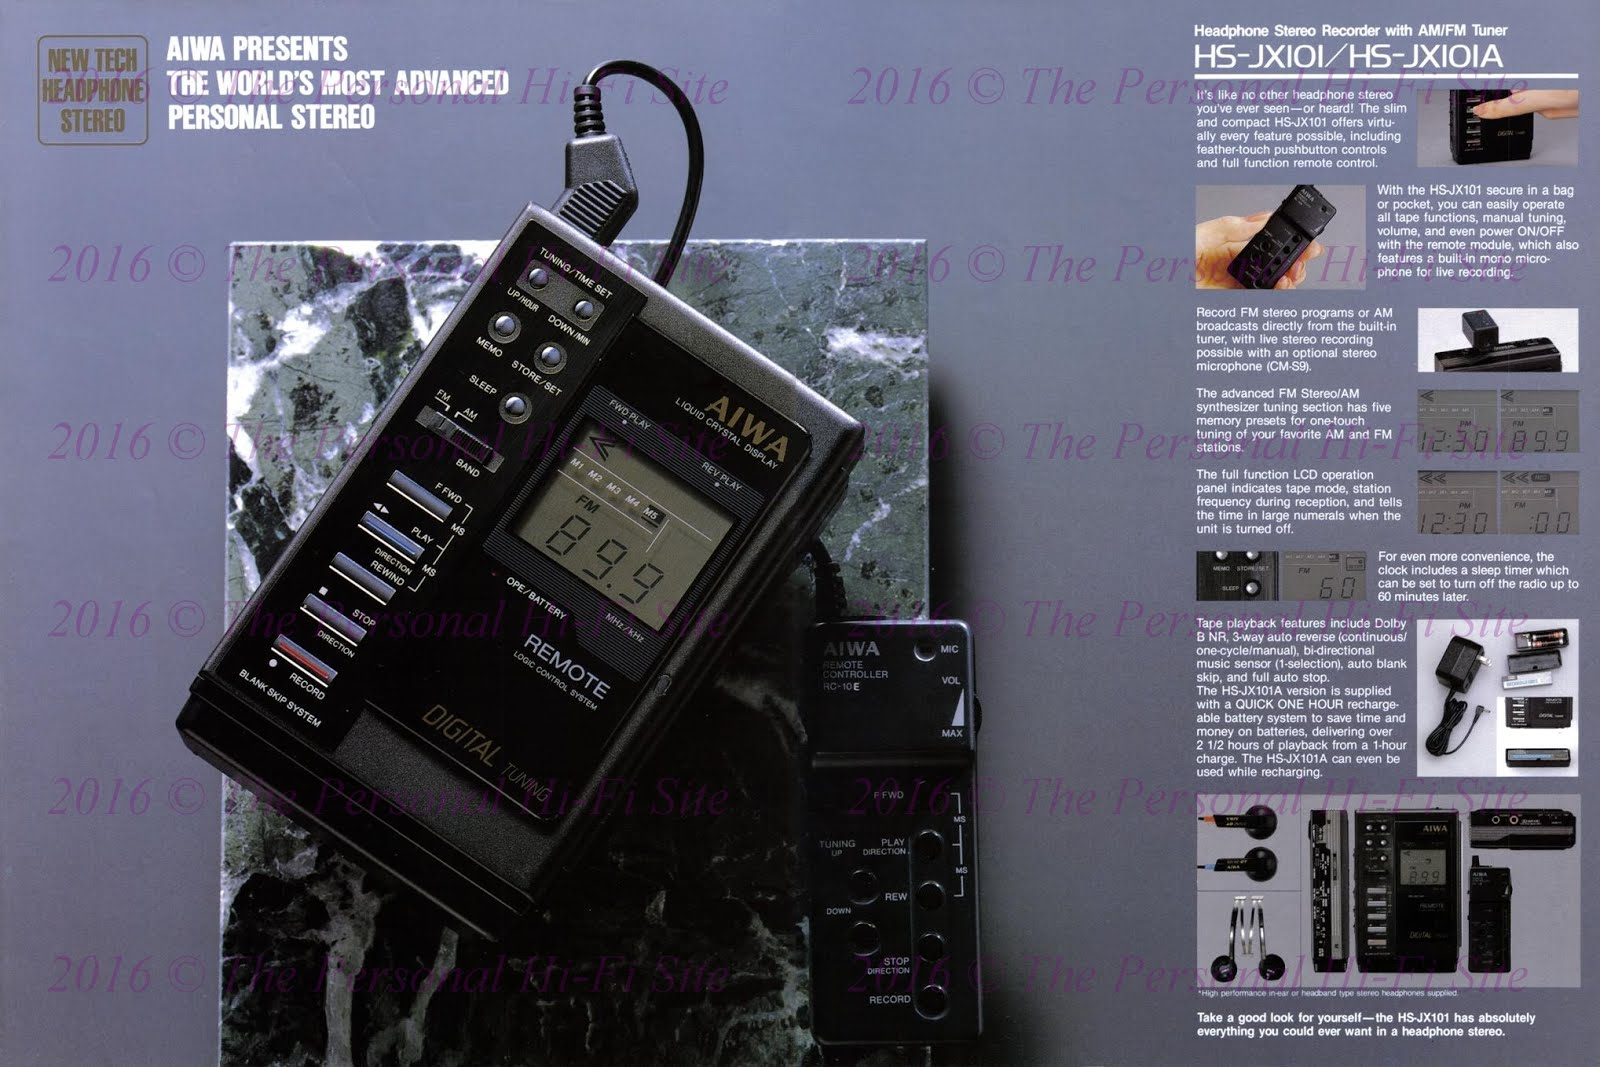 The Personal Hi-Fi Blog: AIWA HS-JX10 / HS-JX101 / HS-JX700